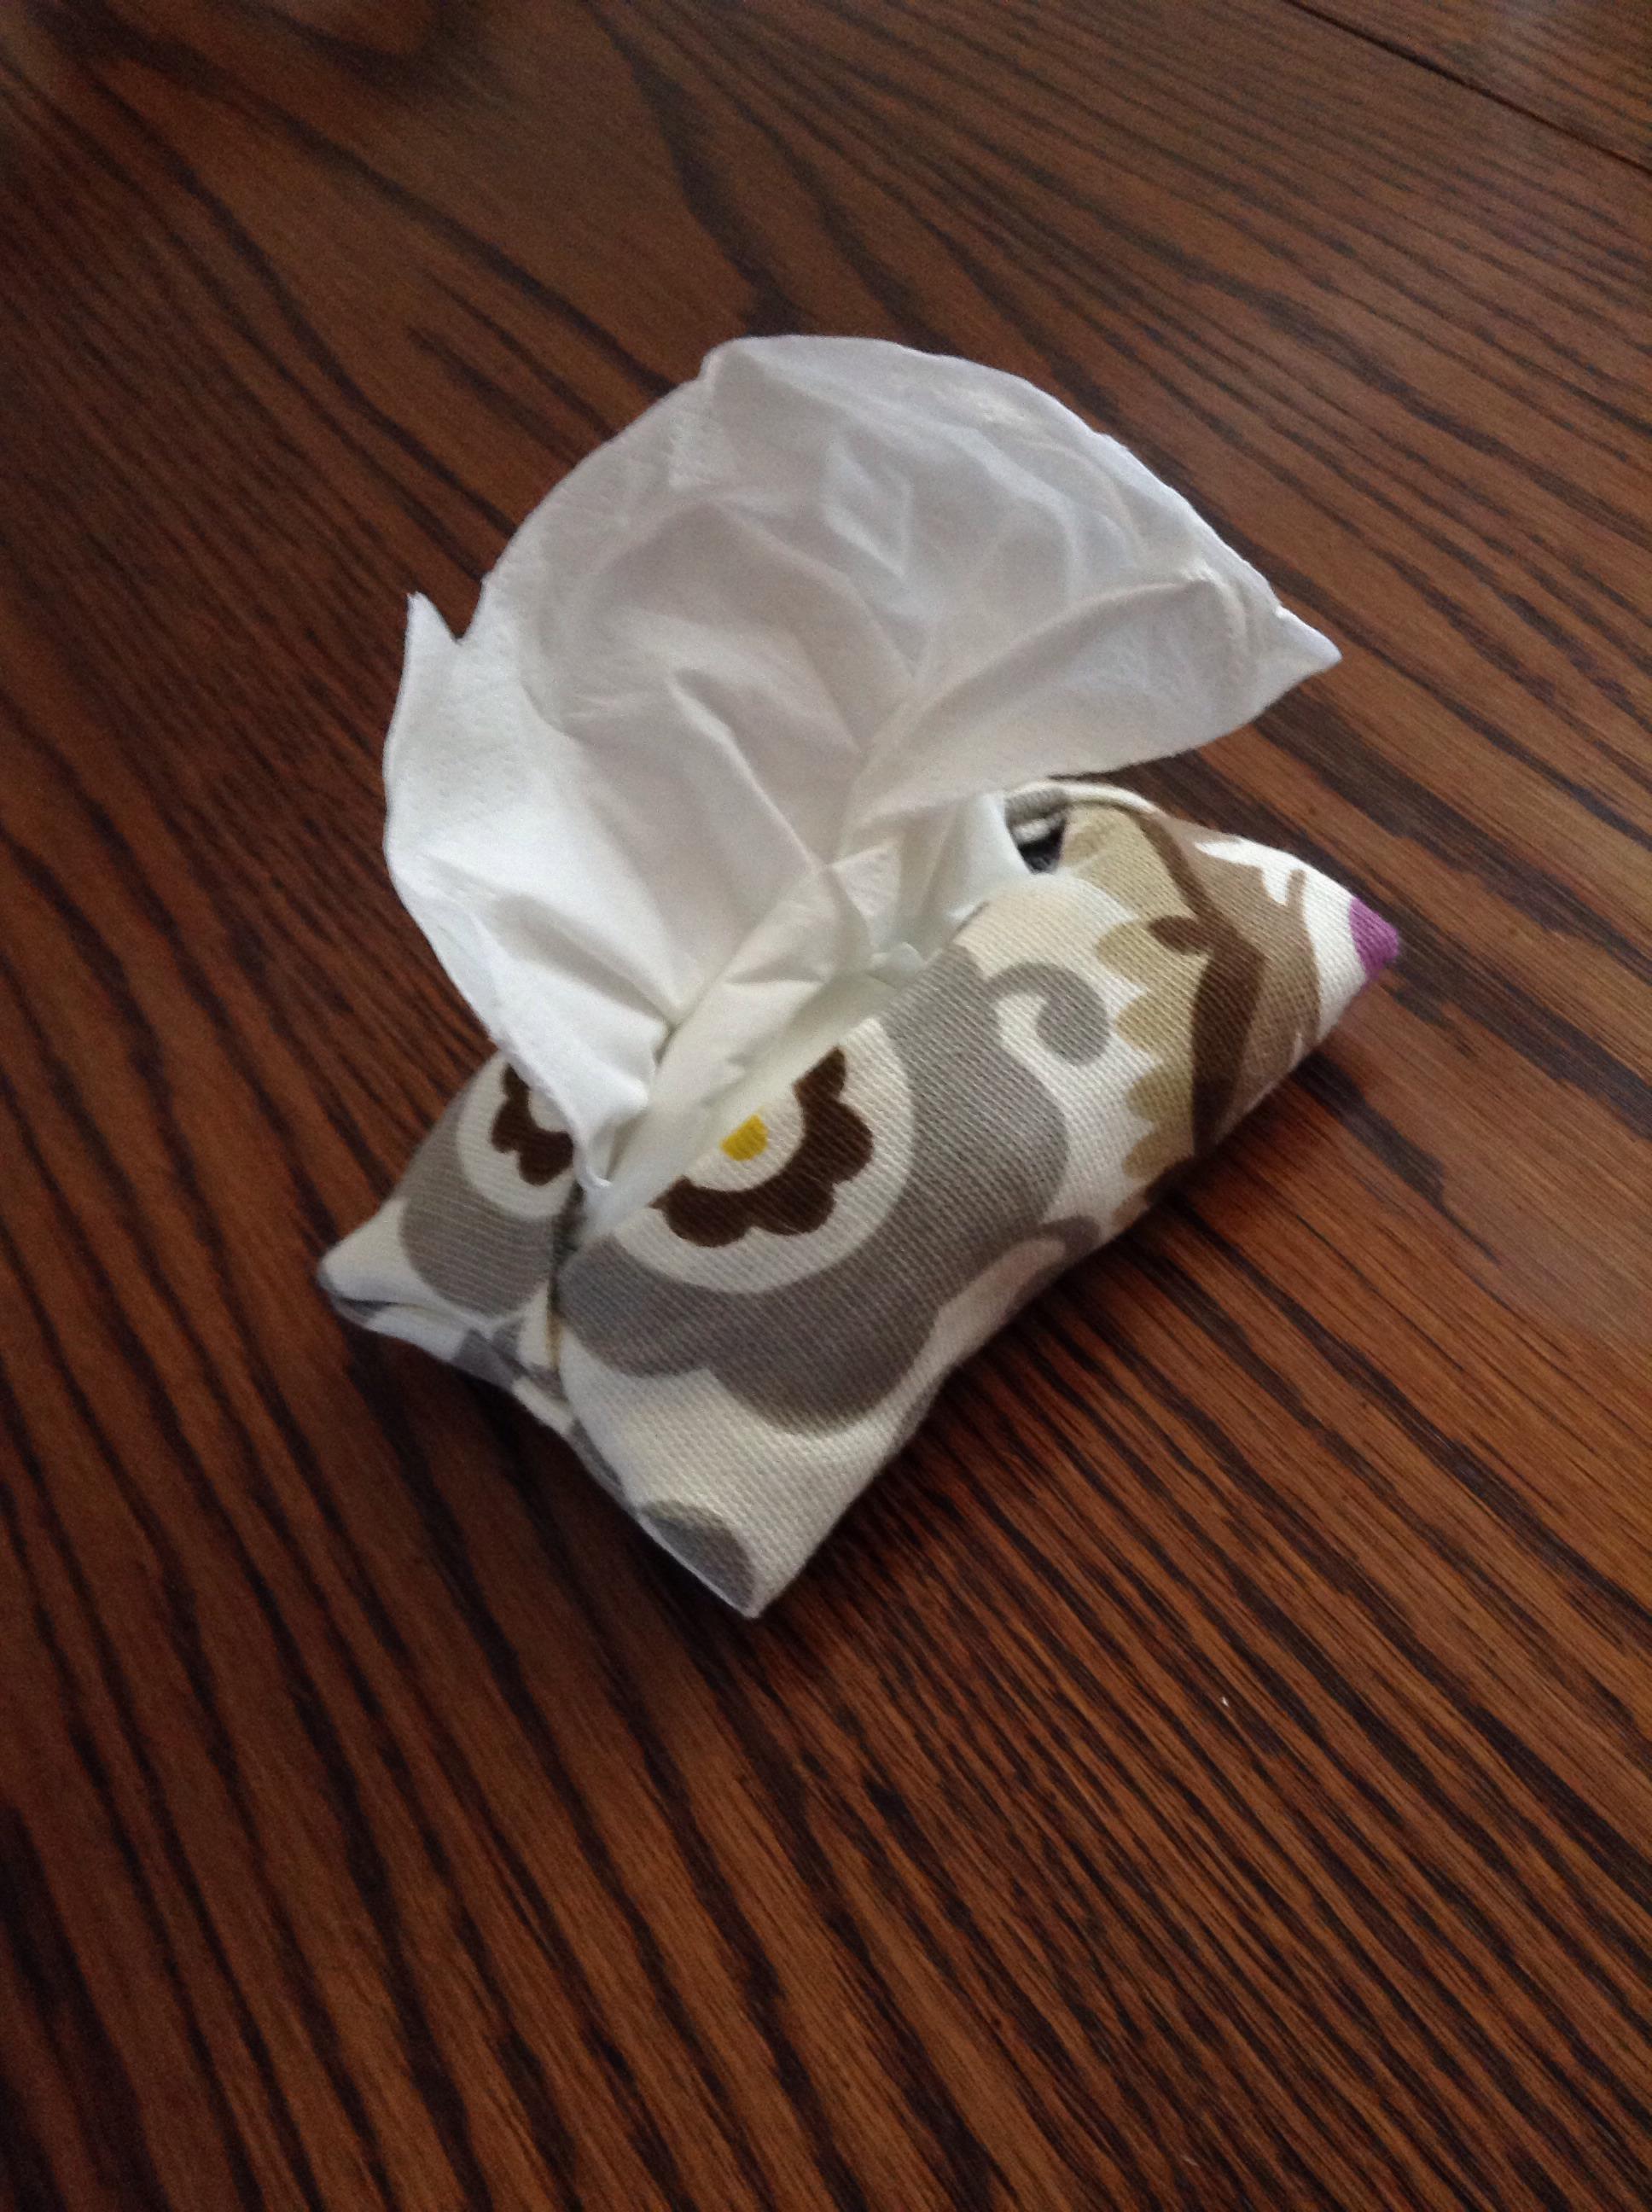 Diy Tissue Holder (or Phone Case)